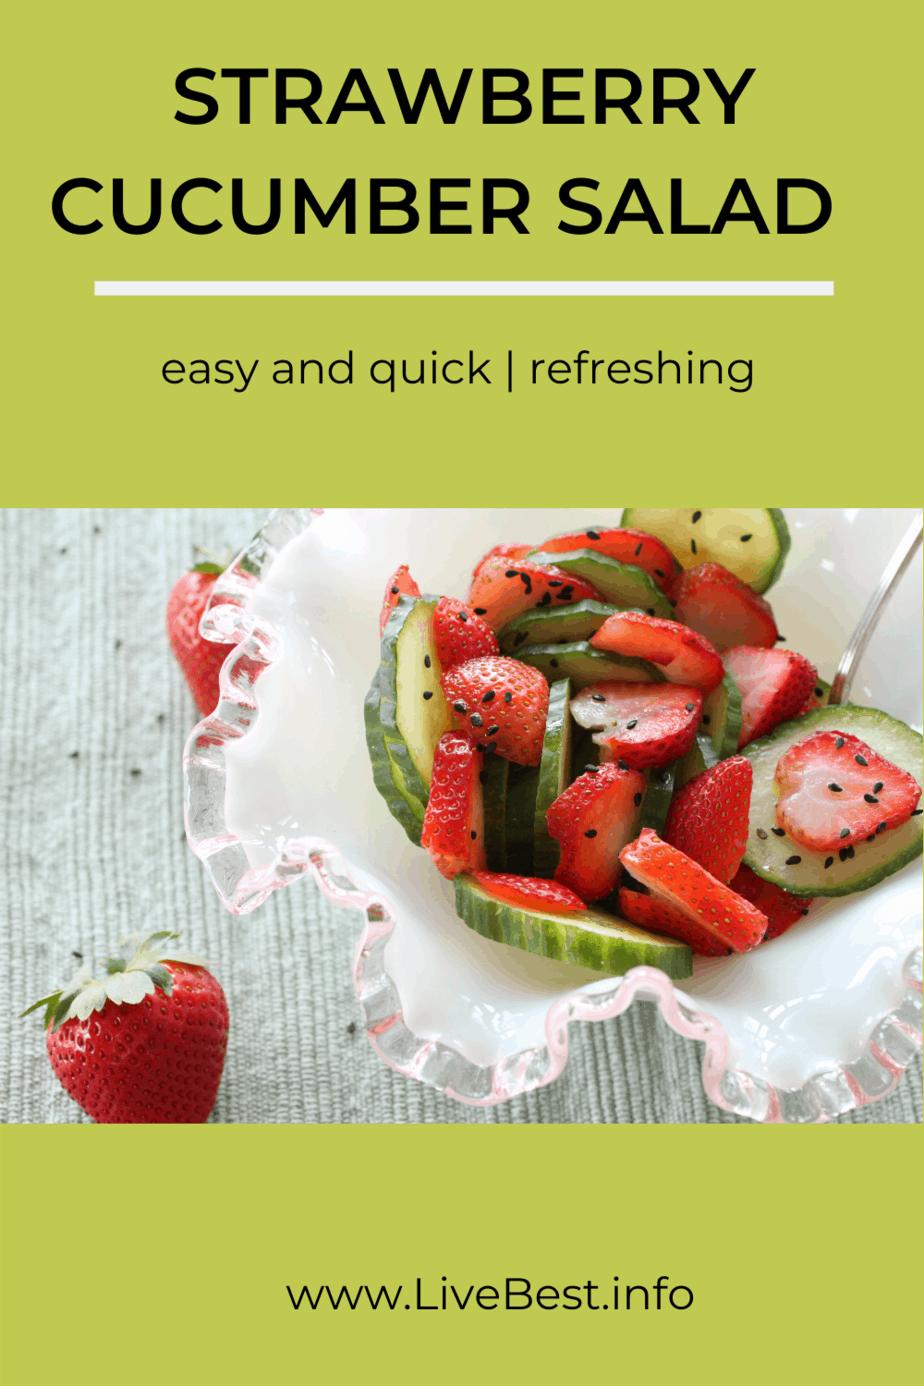 Sliced strawberries and cumbers sprinkled with black sesame seeds